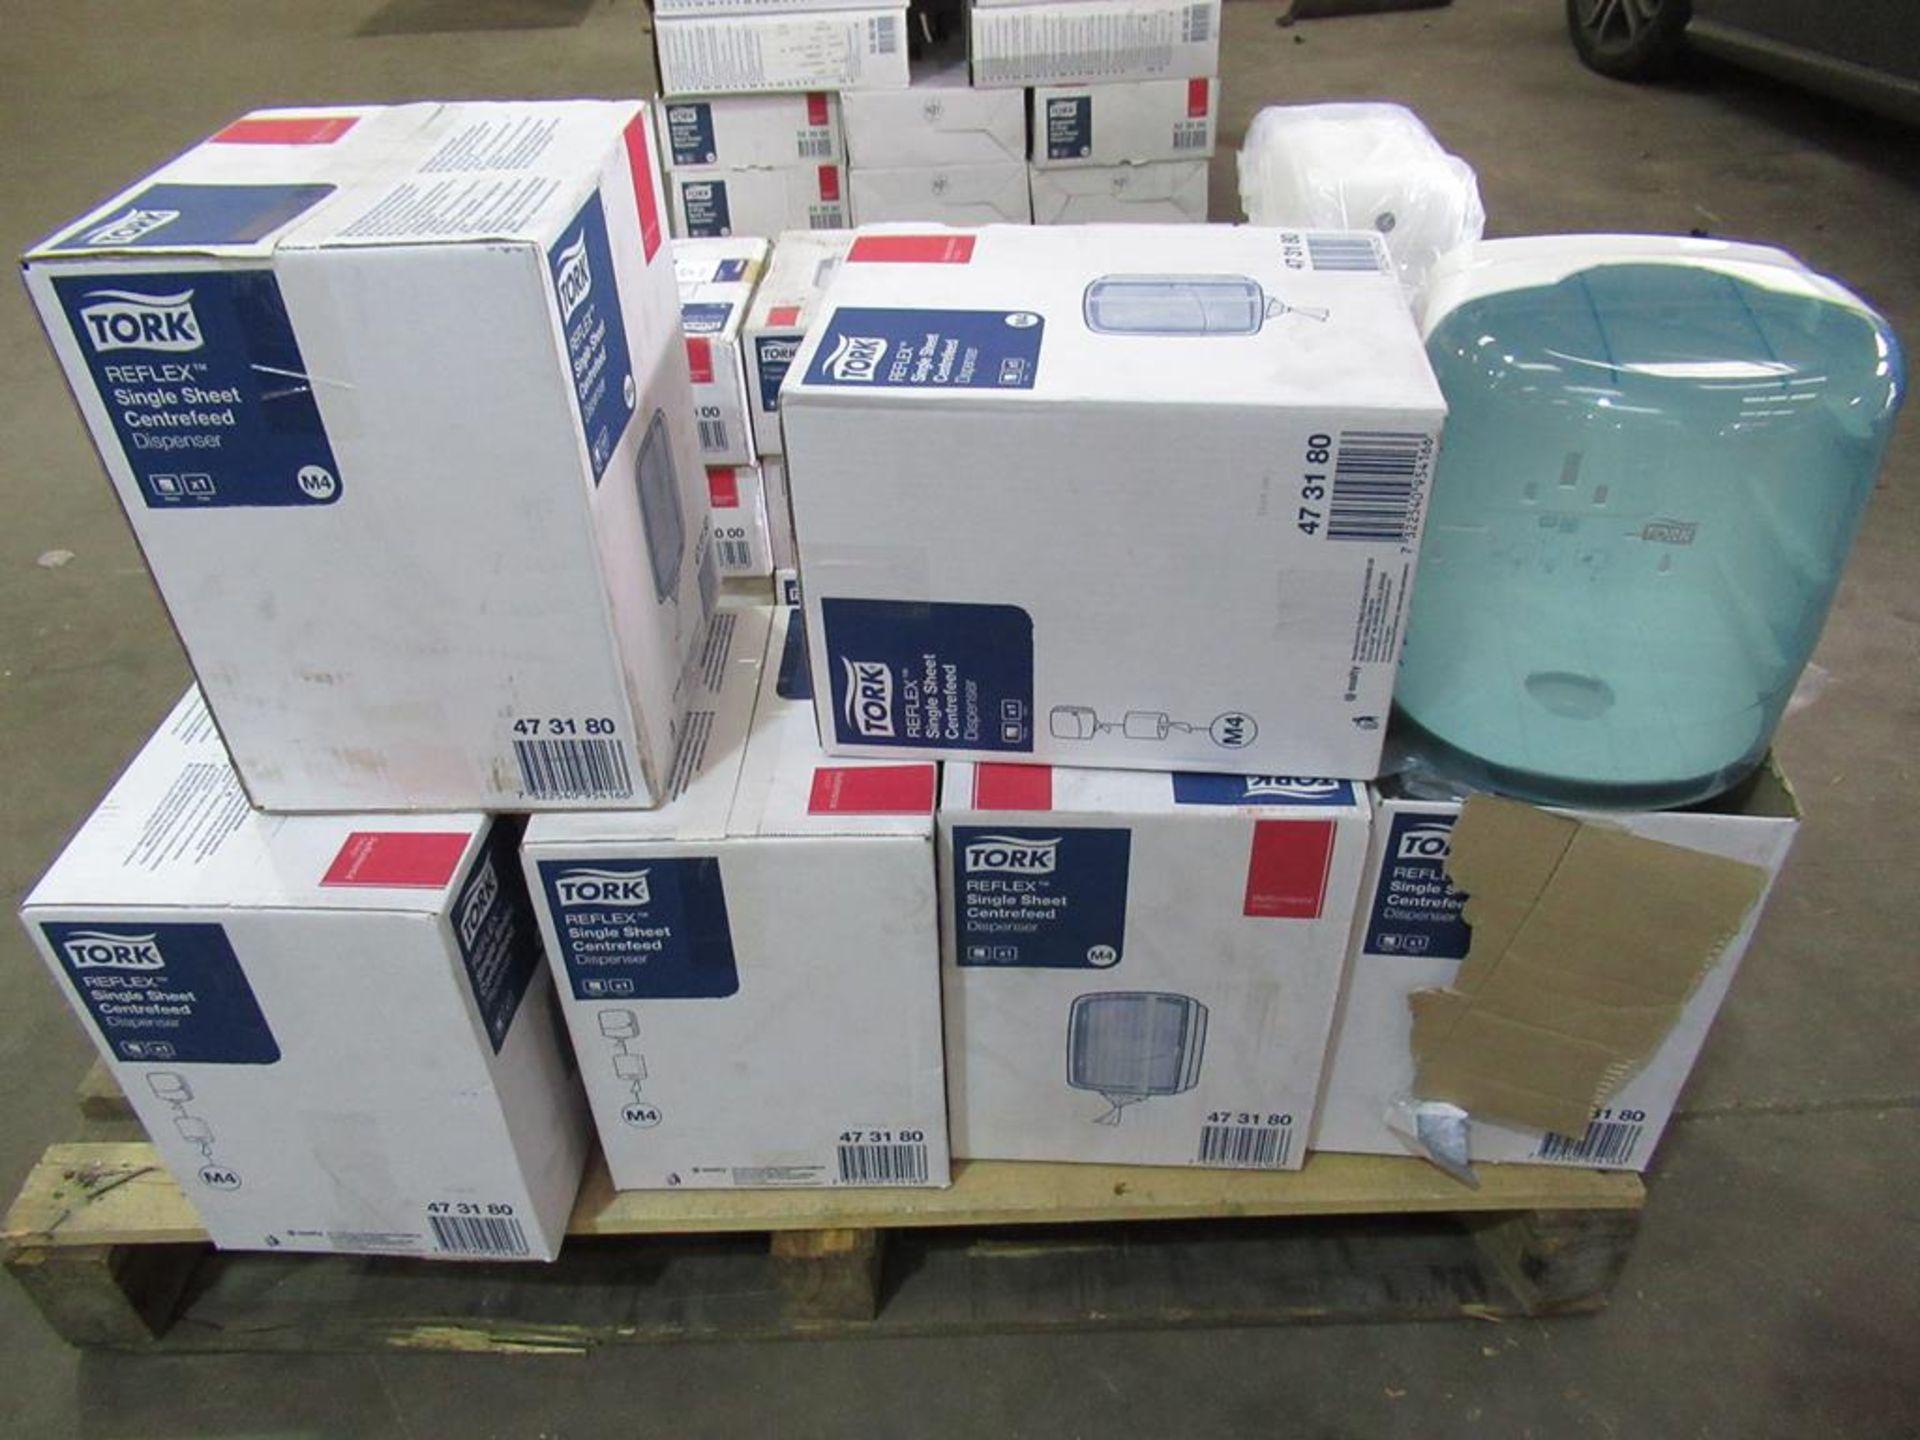 6 x New Tork Reflex Single Sheet White Roll Dispensers - Image 5 of 5